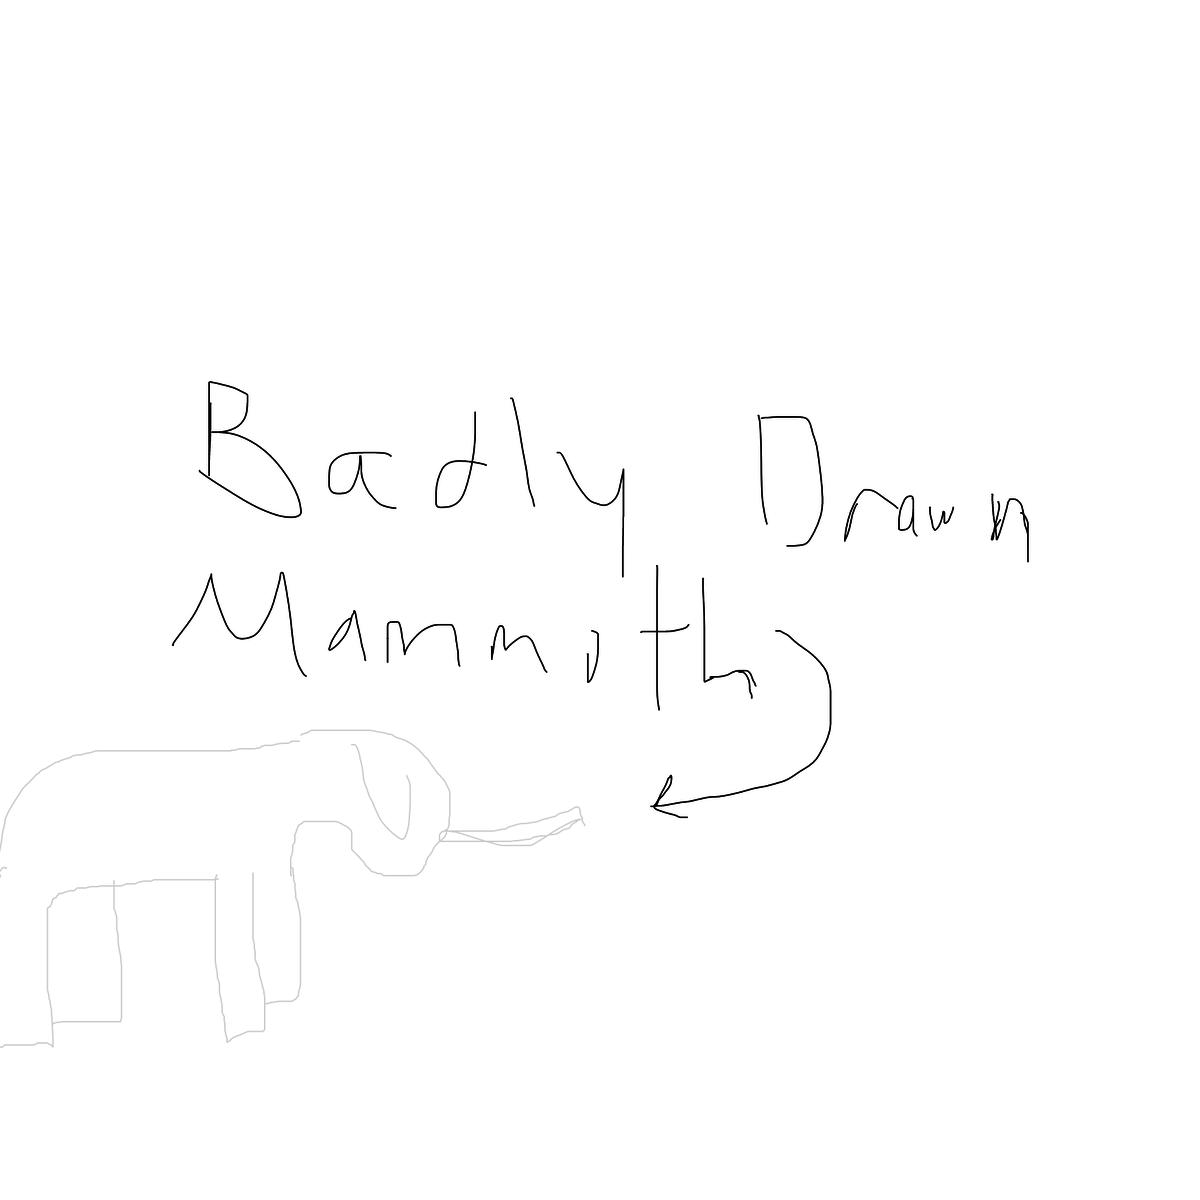 BAAAM drawing#23439 lat:77.0888748168945300lng: 156.5495300292968800